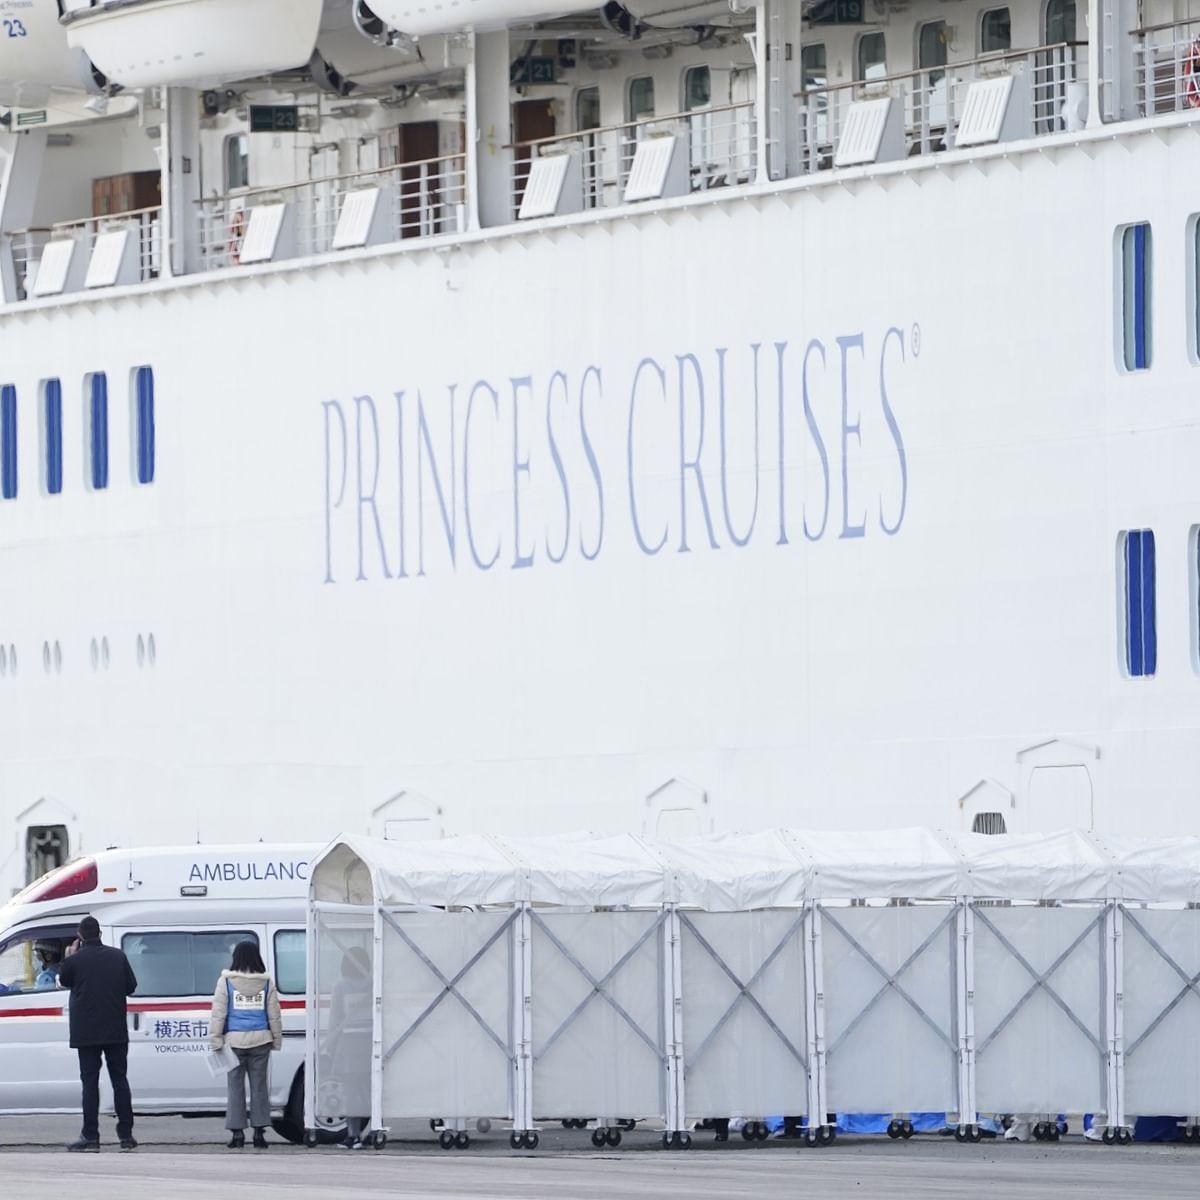 Indians stuck on Japan cruise ship